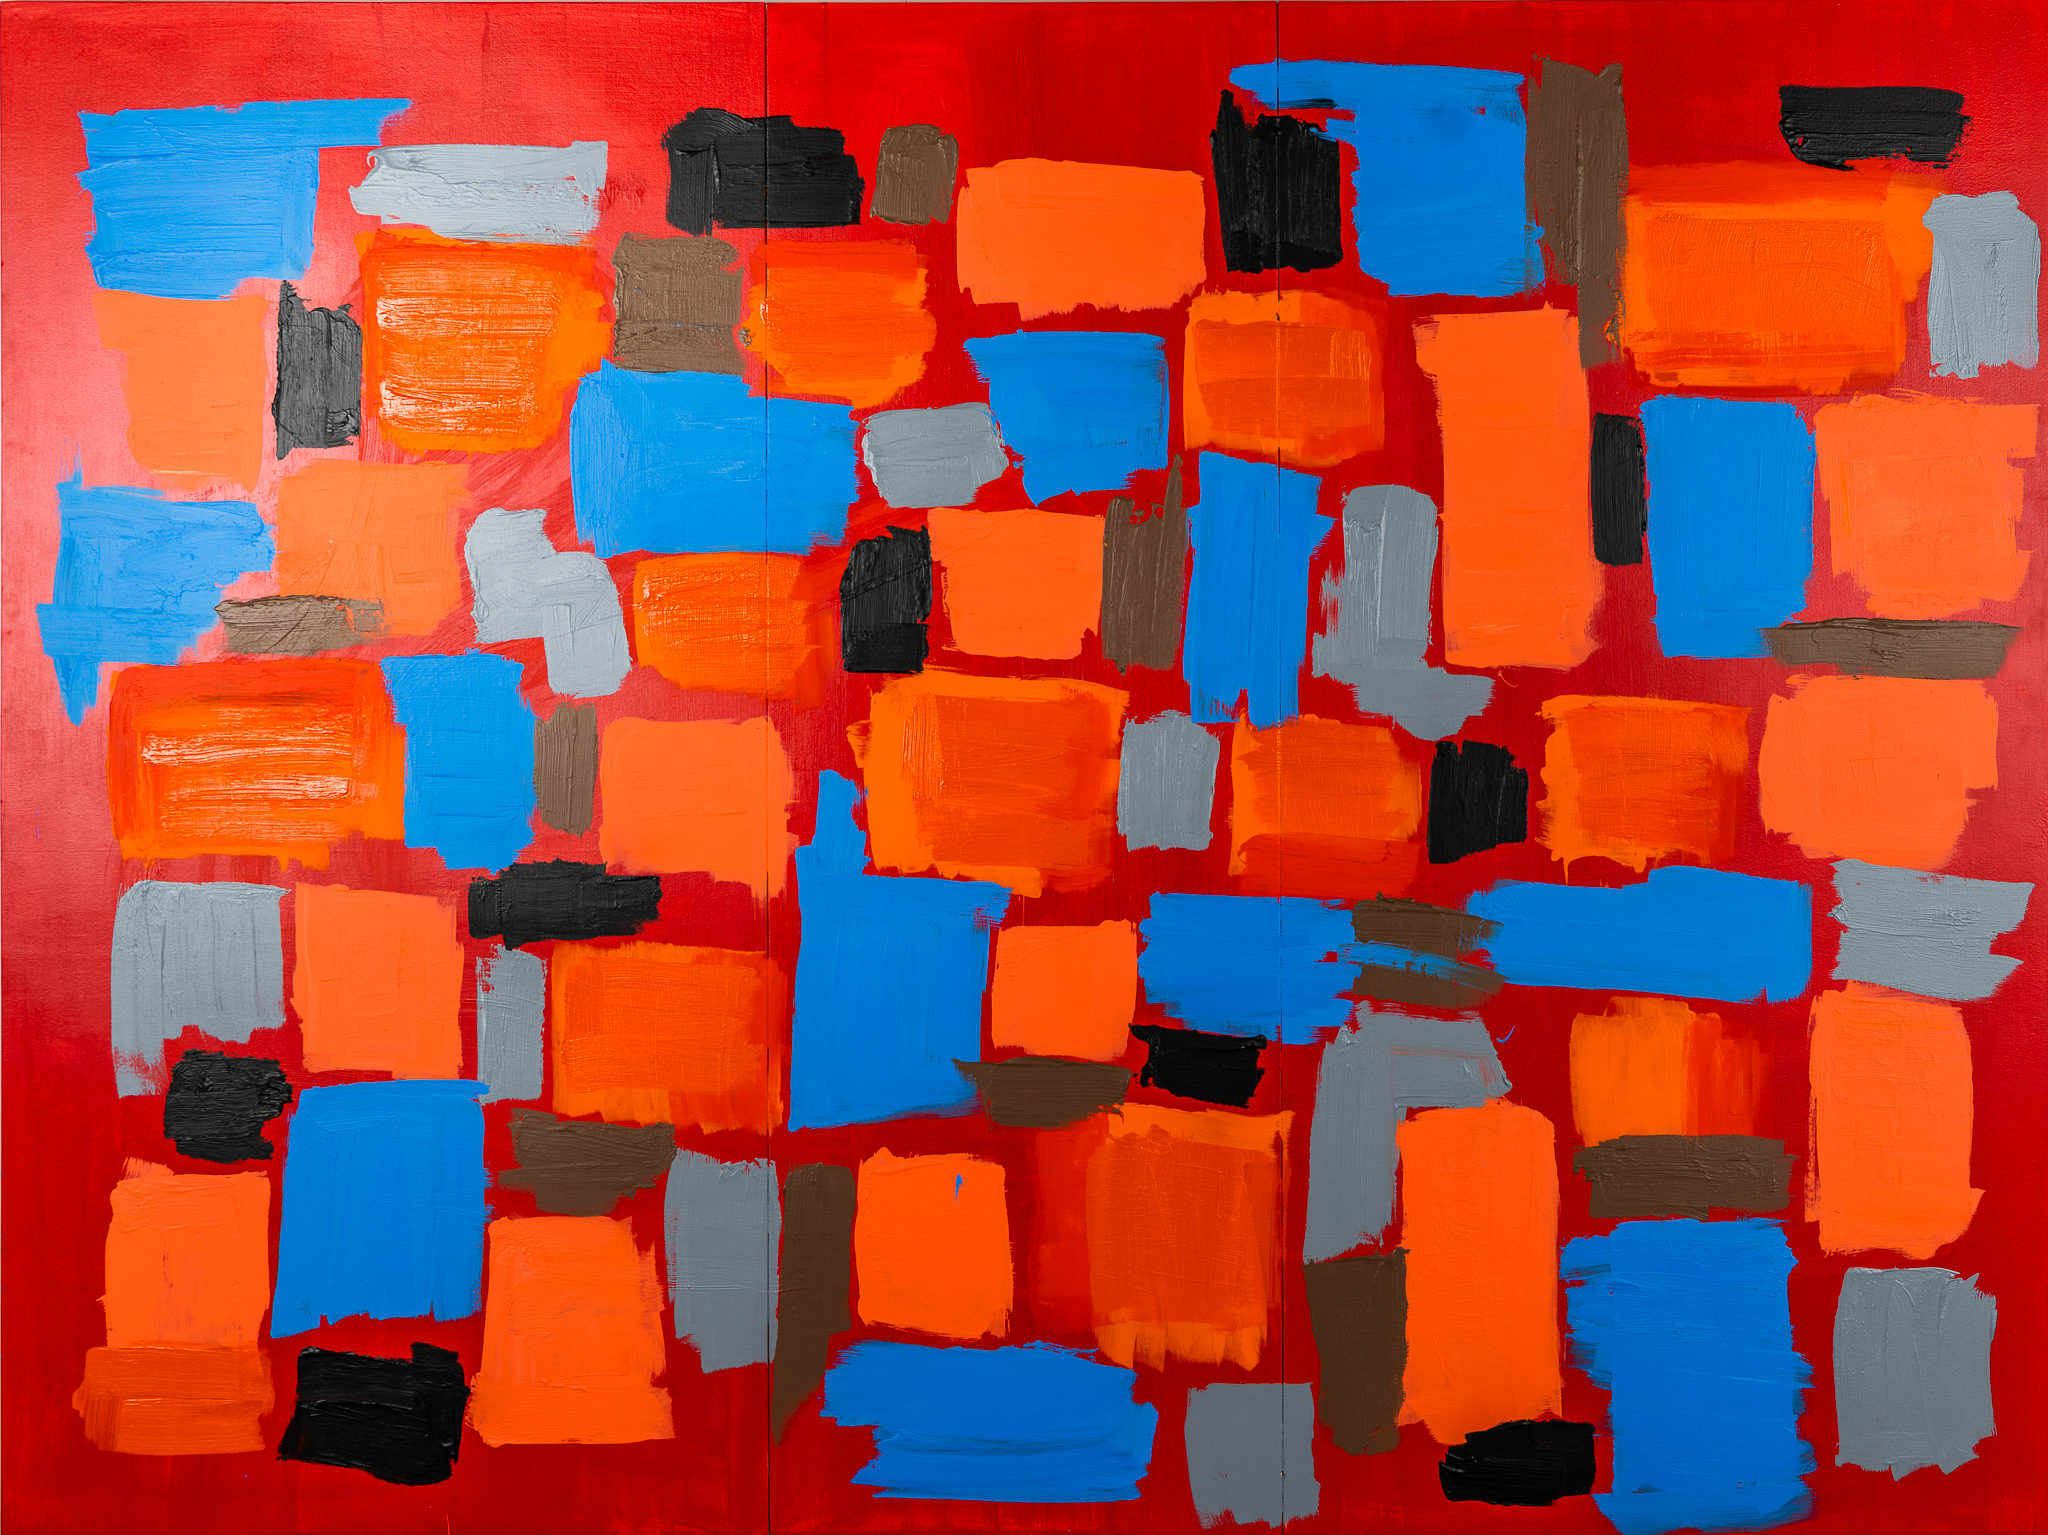 "<span class=""link fancybox-details-link""><a href=""/artworks/categories/5/2317-emilio-diiorio-tenth-avenue-2019/"">View Detail Page</a></span><div class=""artist""><strong>Emilio DiIorio</strong></div> <div class=""title""><em>Tenth Avenue</em>, 2019</div> <div class=""medium"">Acrylic on panel </div> <div class=""dimensions"">60 x 96 in<br /> 152.4 x 243.8 cm</div>"